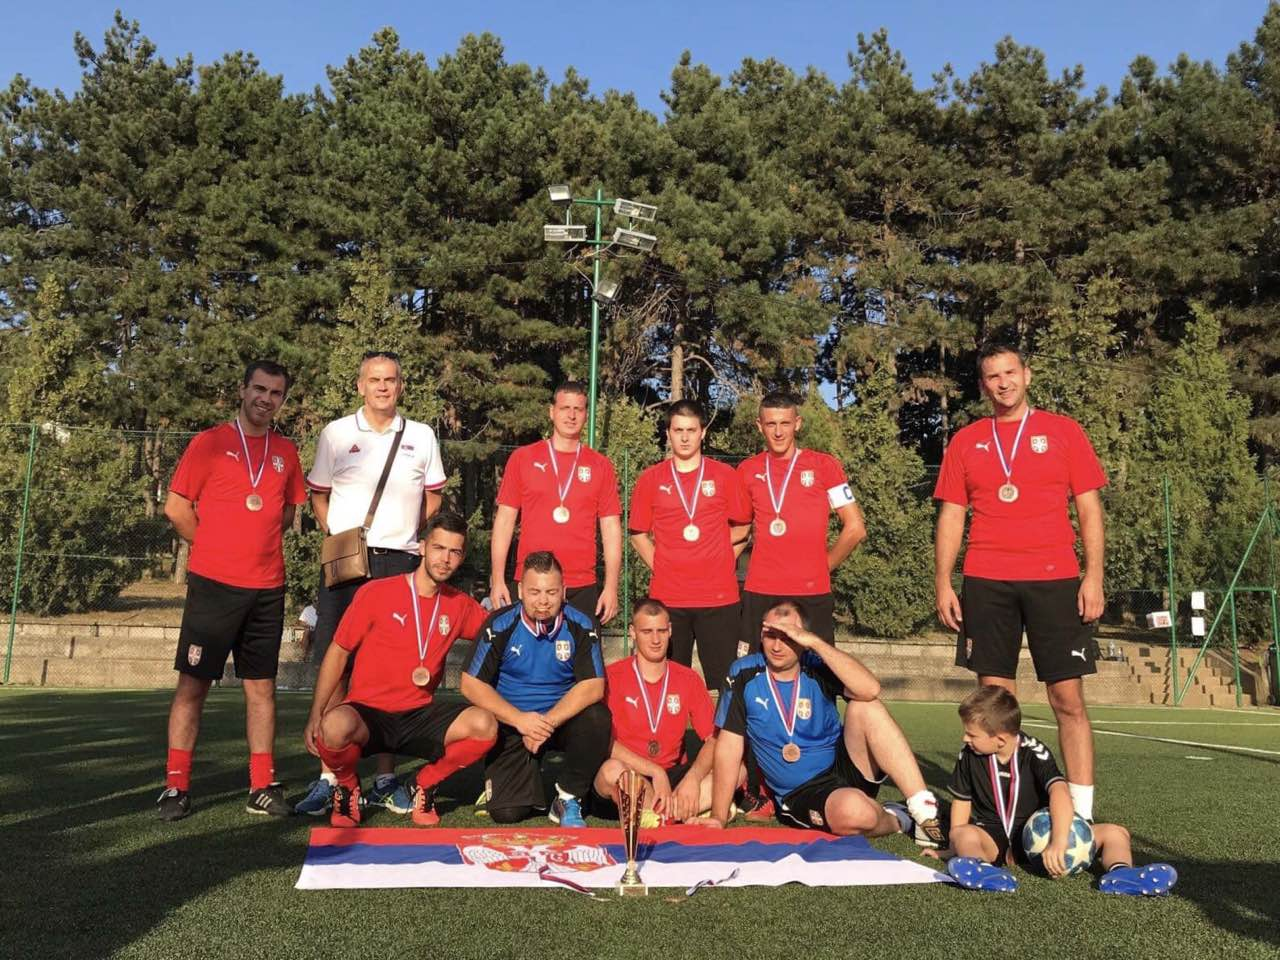 "Екипа Министарства омладине и спорта на другом Хуманитарном фудбалском турниру ""Diplomats 4 Children"""